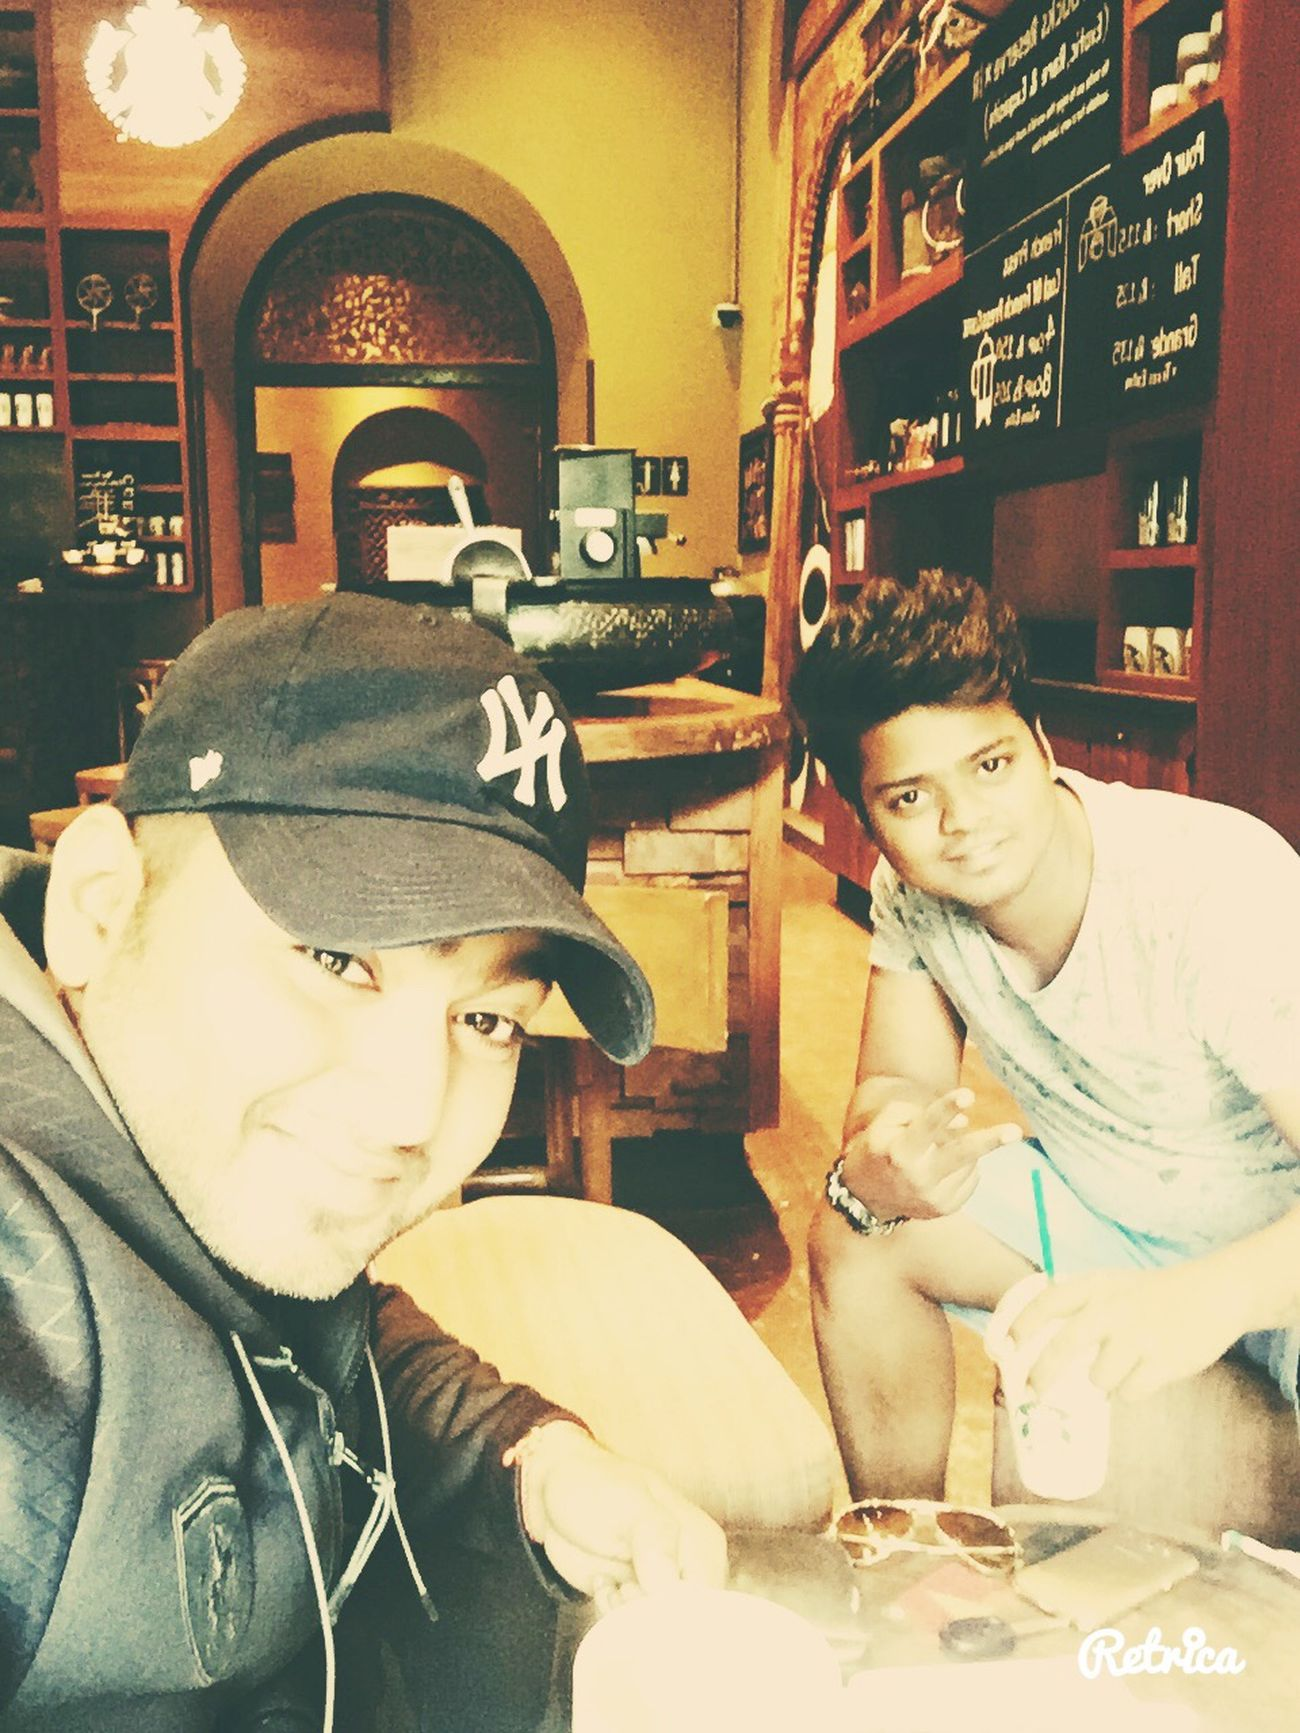 Starbucks Good Morning Breakfast Best Friends Coffee HappyFriendshipDay